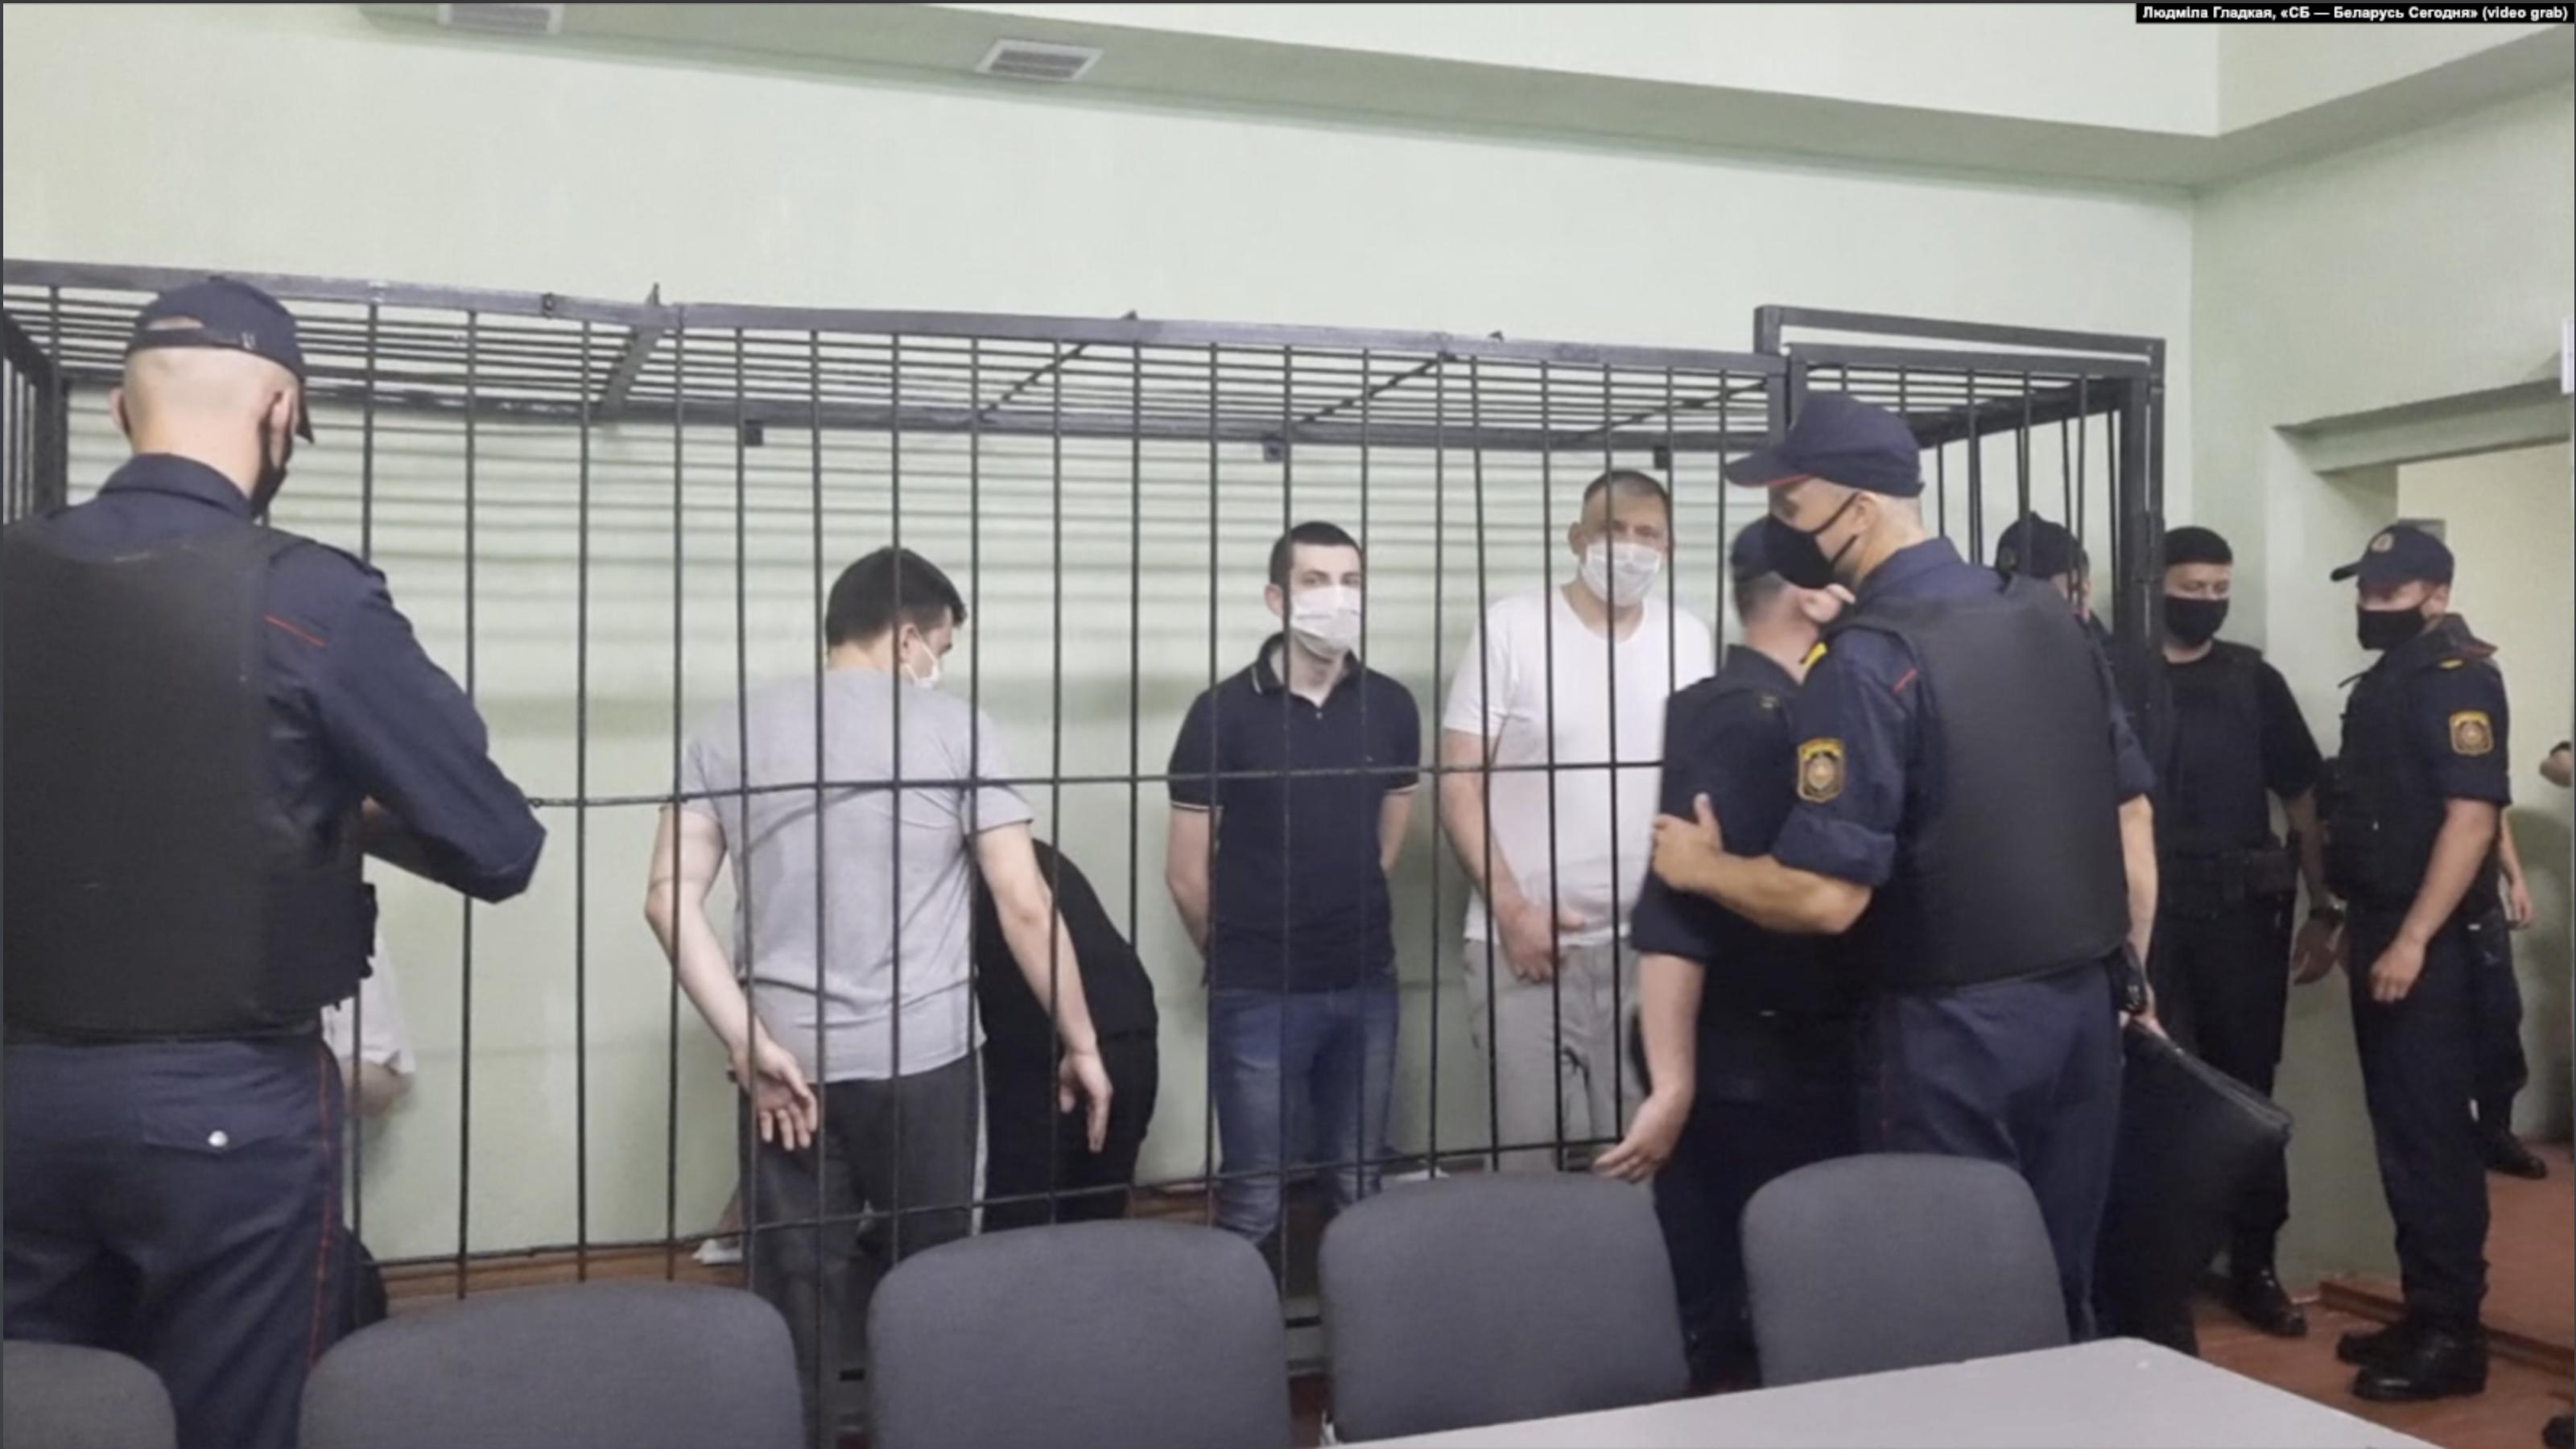 'Mockery of Justice': RFE/RL demands Losik's release as show trial gets under way in Belarus